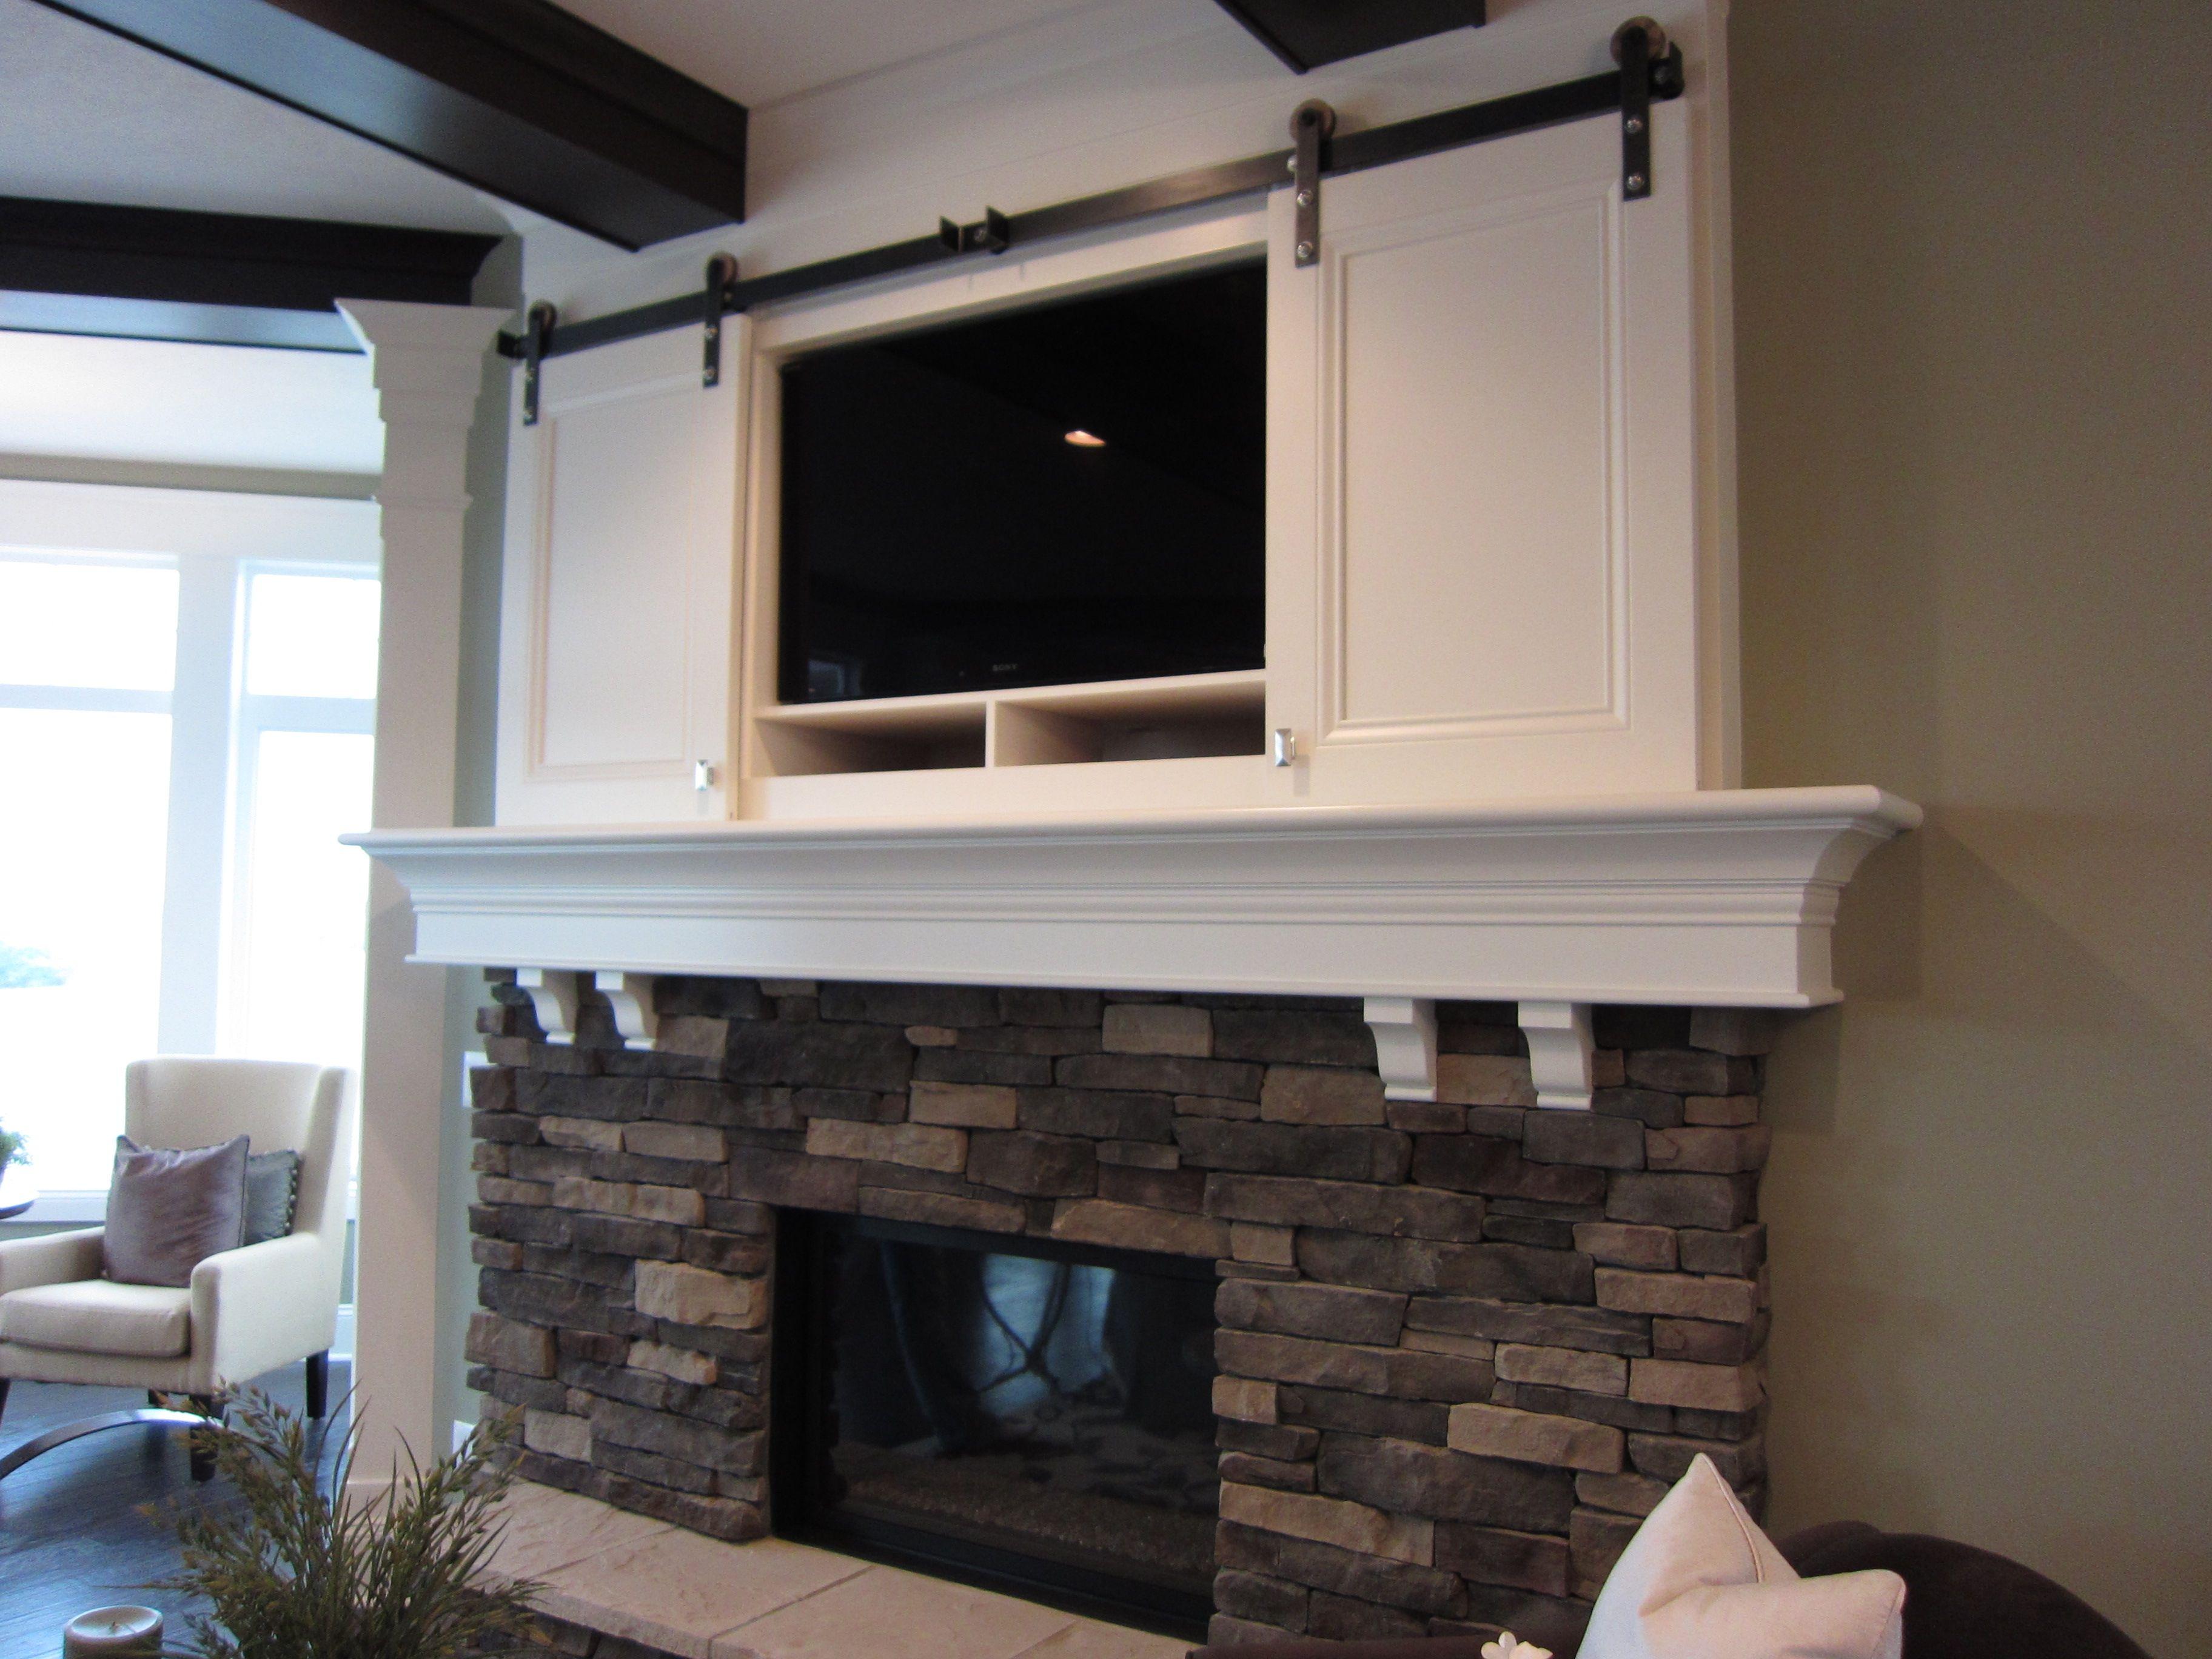 Fireplace and Tv Ideas Luxury Fireplace Tv Mantel Ideas Best 25 Tv Above Fireplace Ideas